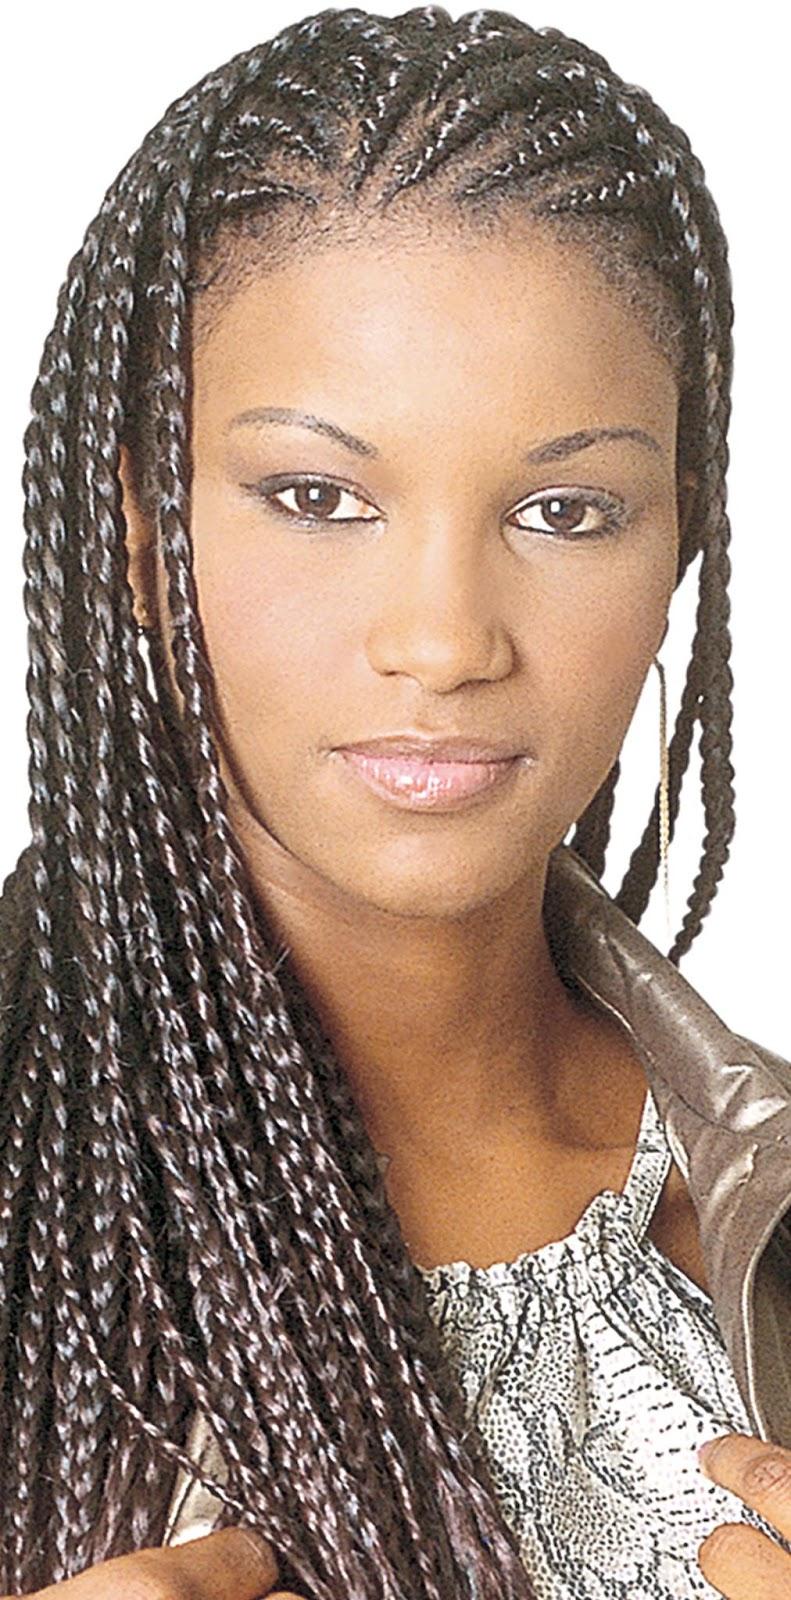 Deluxe Hair Styleartificial Hairsynthetic Hair Hair Weaving